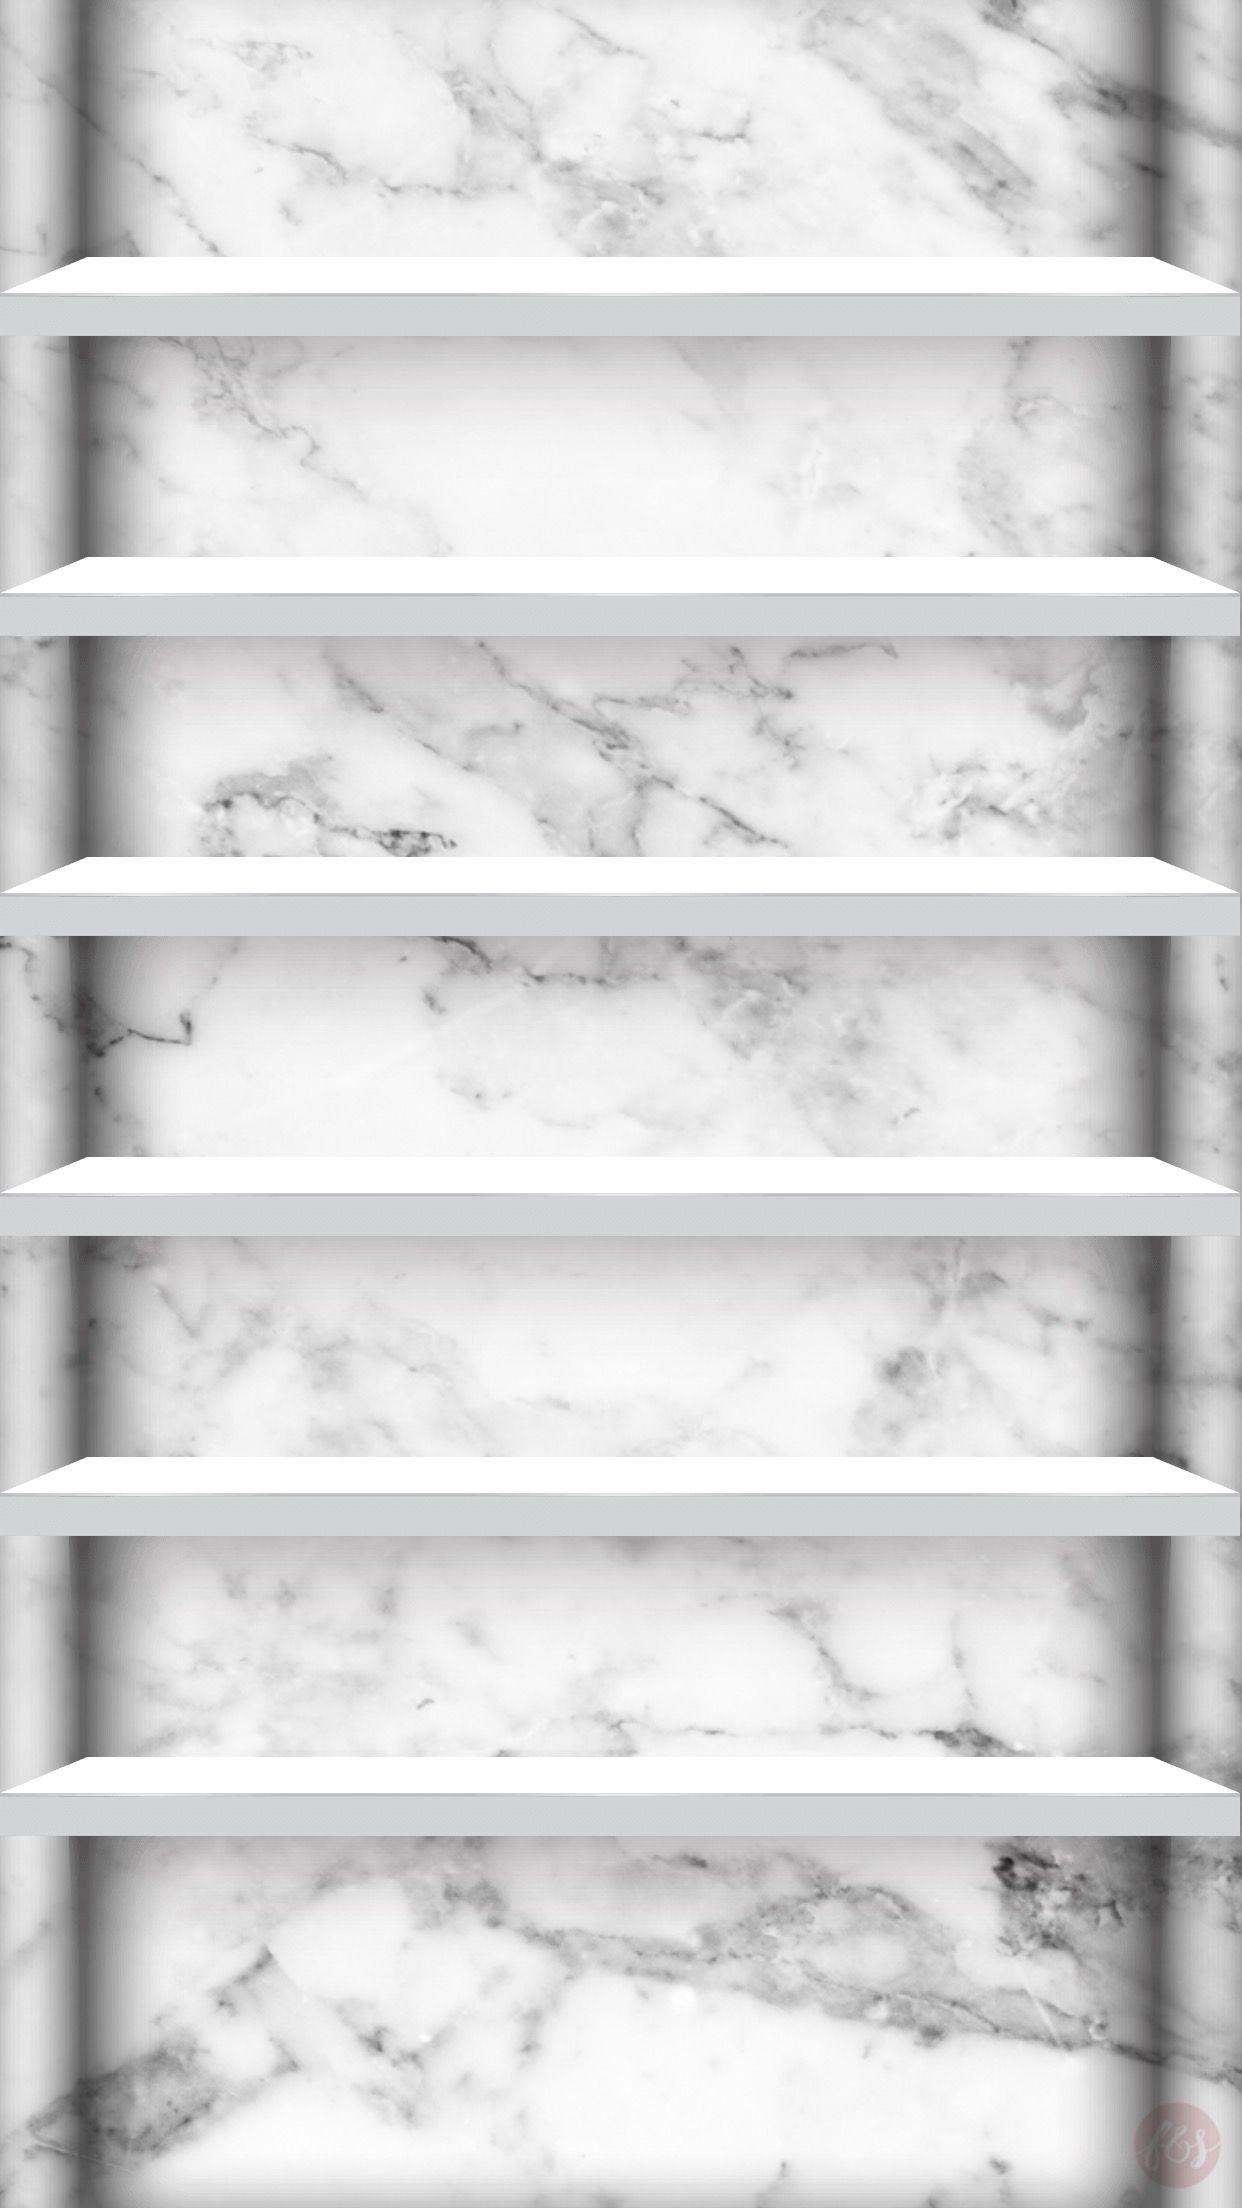 Marble Iphone Shelves Marble Iphone Wallpaper Wallpaper Shelves